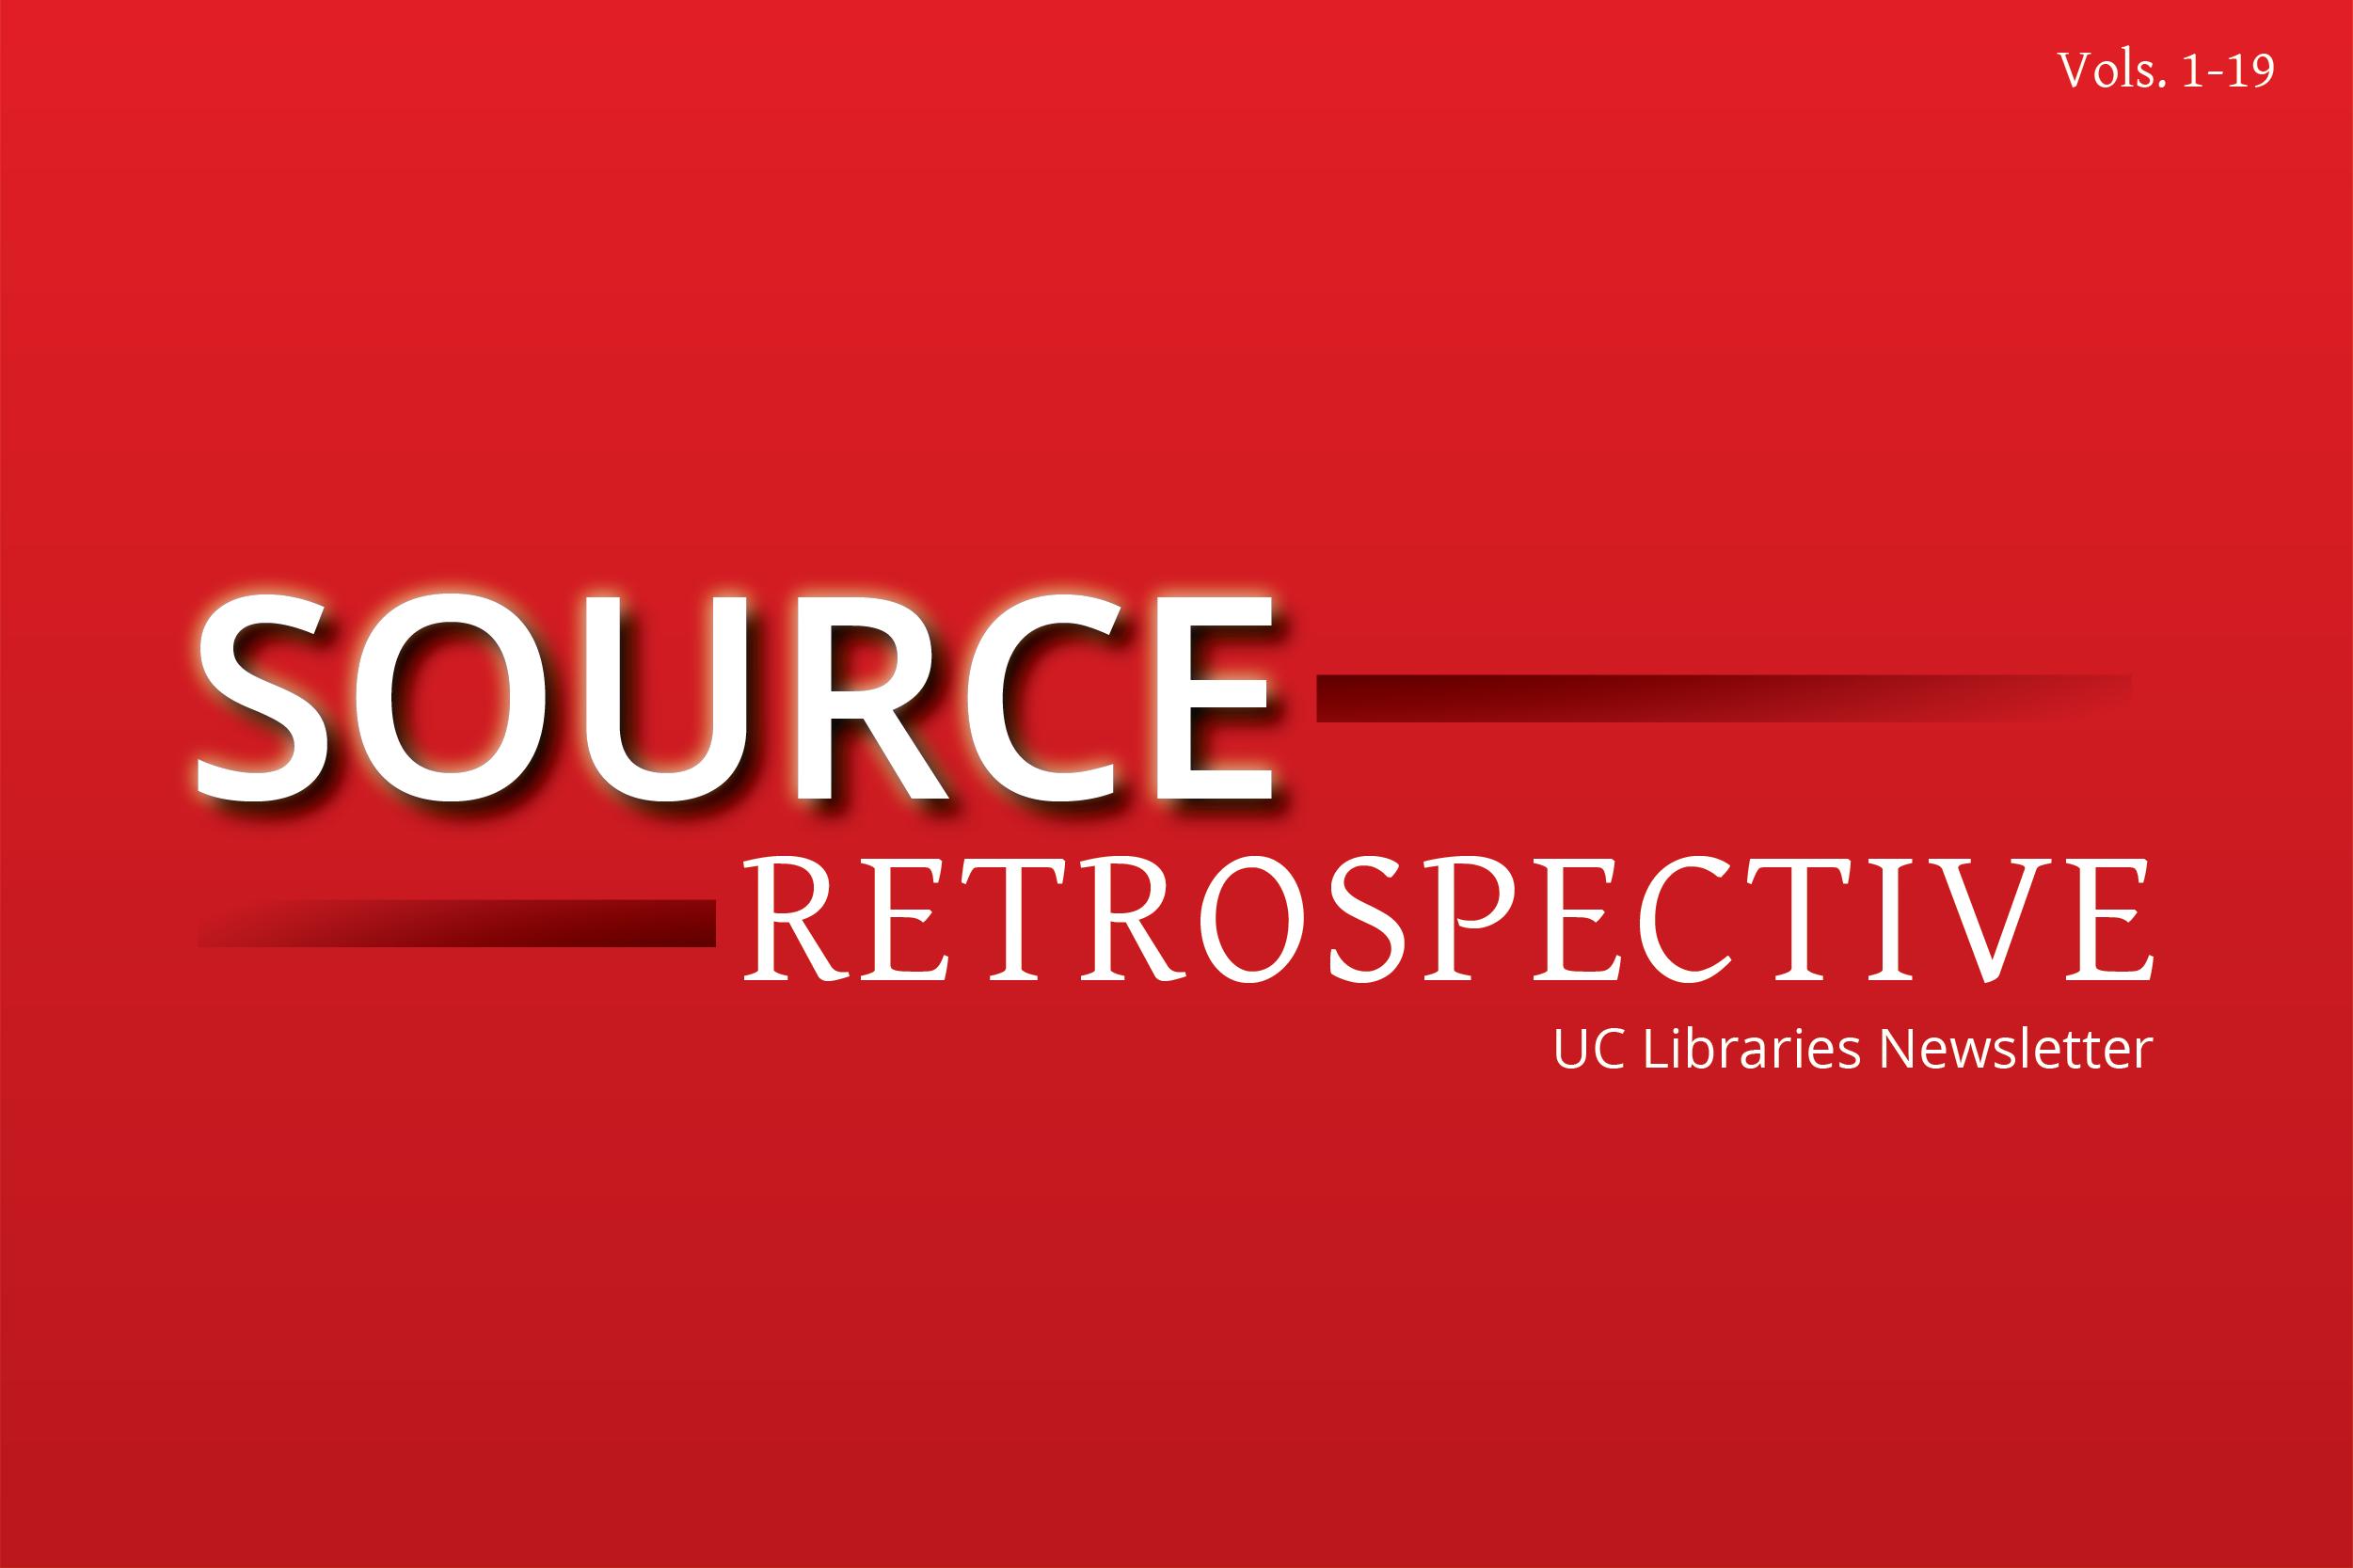 source retrospective